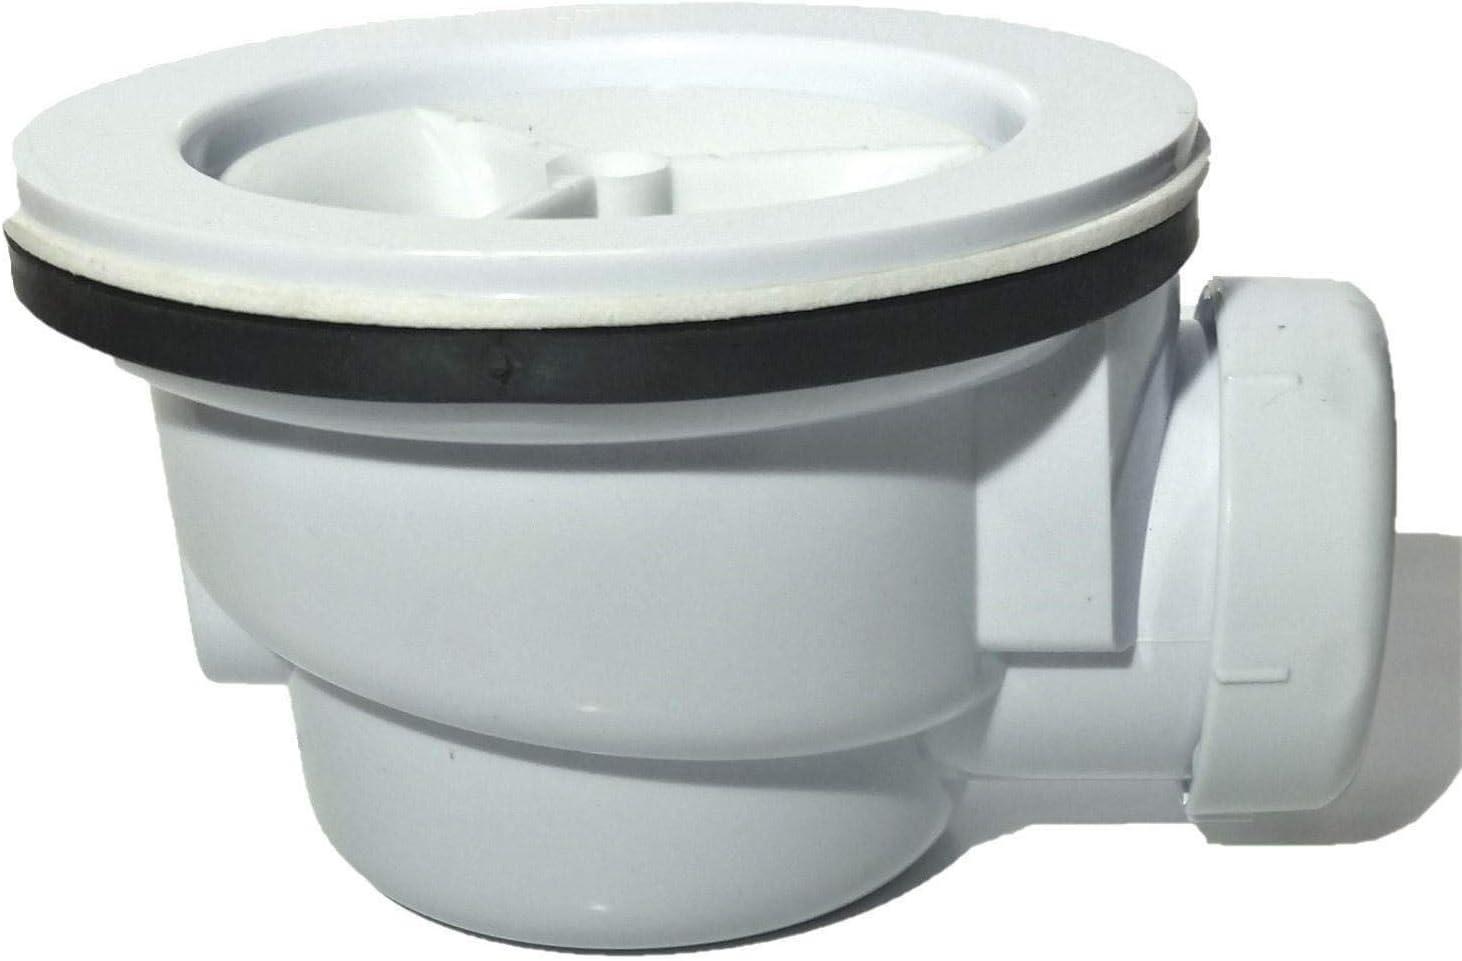 Válvula de desagüe para platos de ducha de resina pizarra 90 mm ...